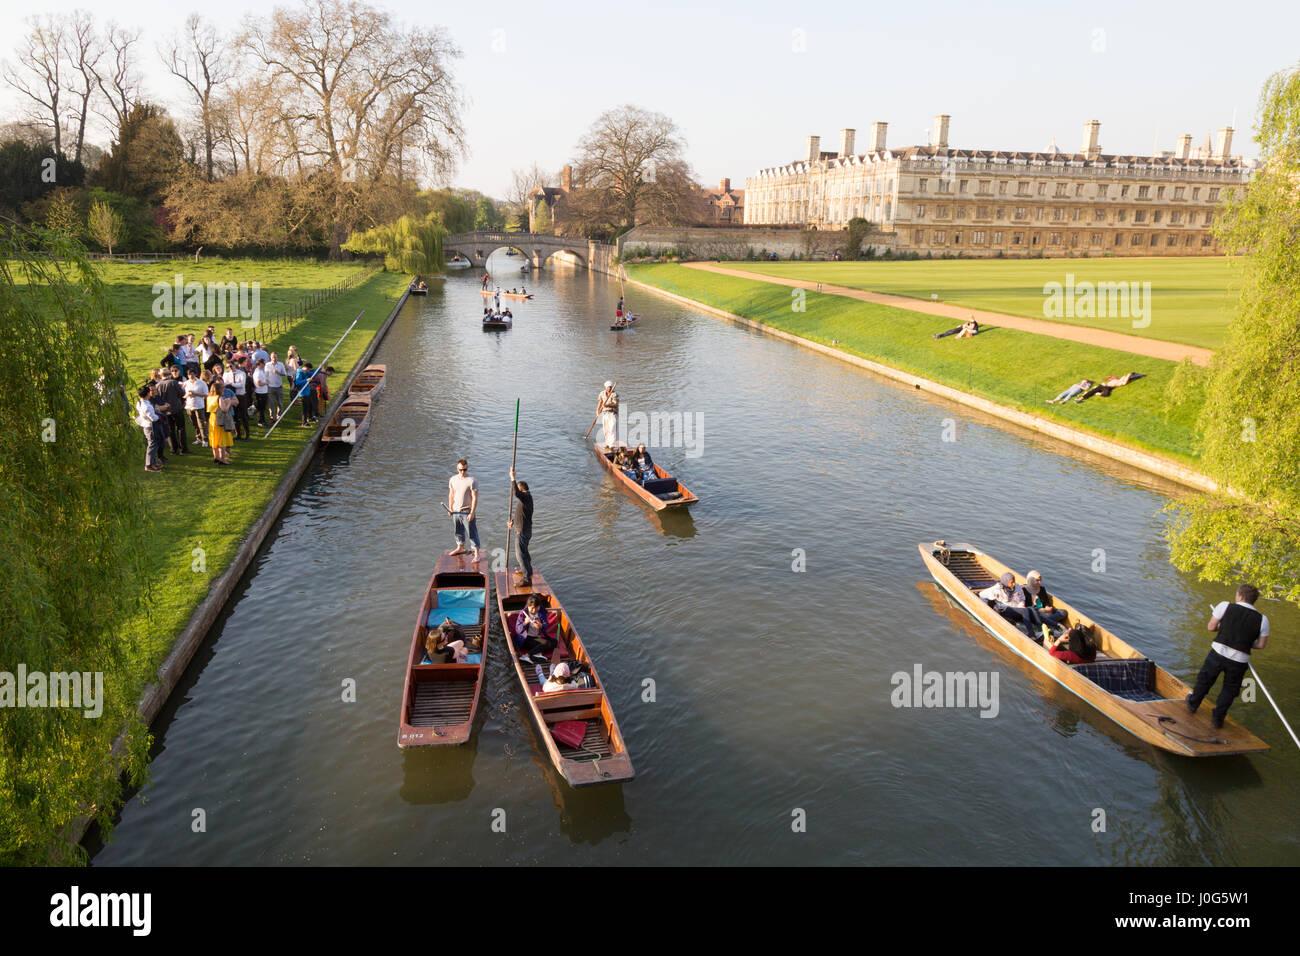 Cambridge Stechkahn fahren auf dem Fluss Cam auf dem Rücken, Cambridge UK Stockbild